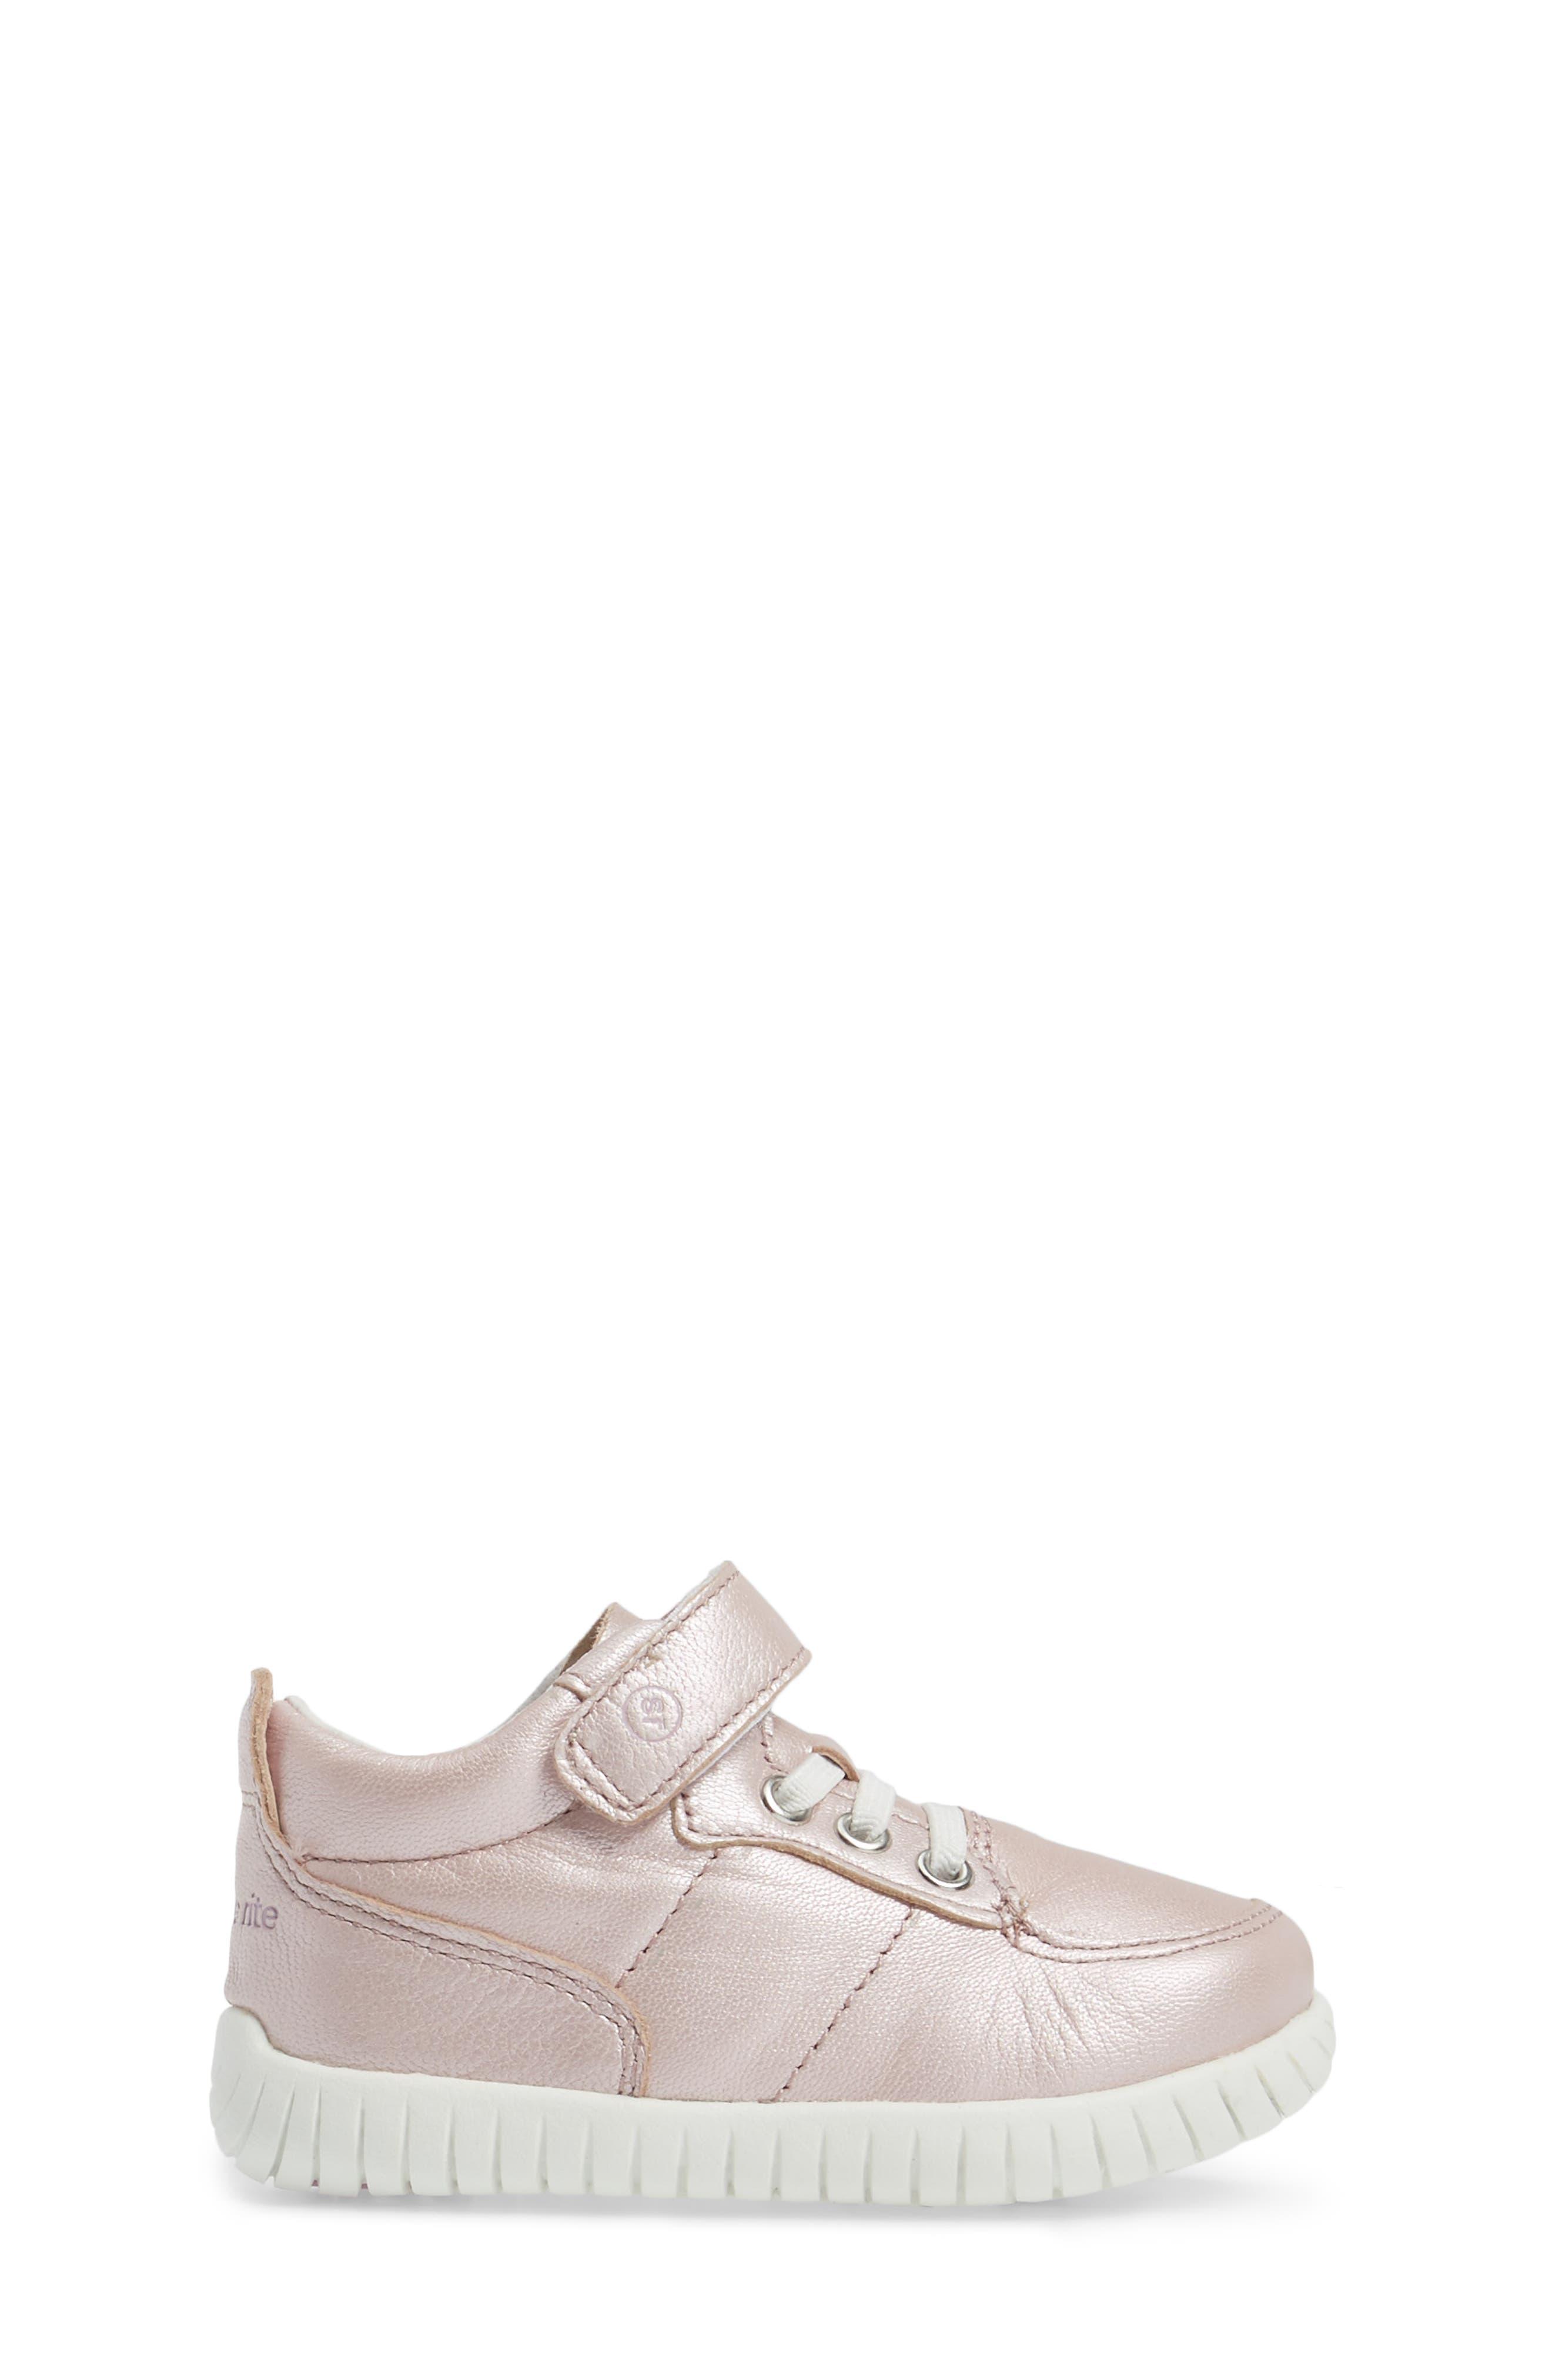 Bailey High Top Sneaker,                             Alternate thumbnail 3, color,                             PINK METALLIC